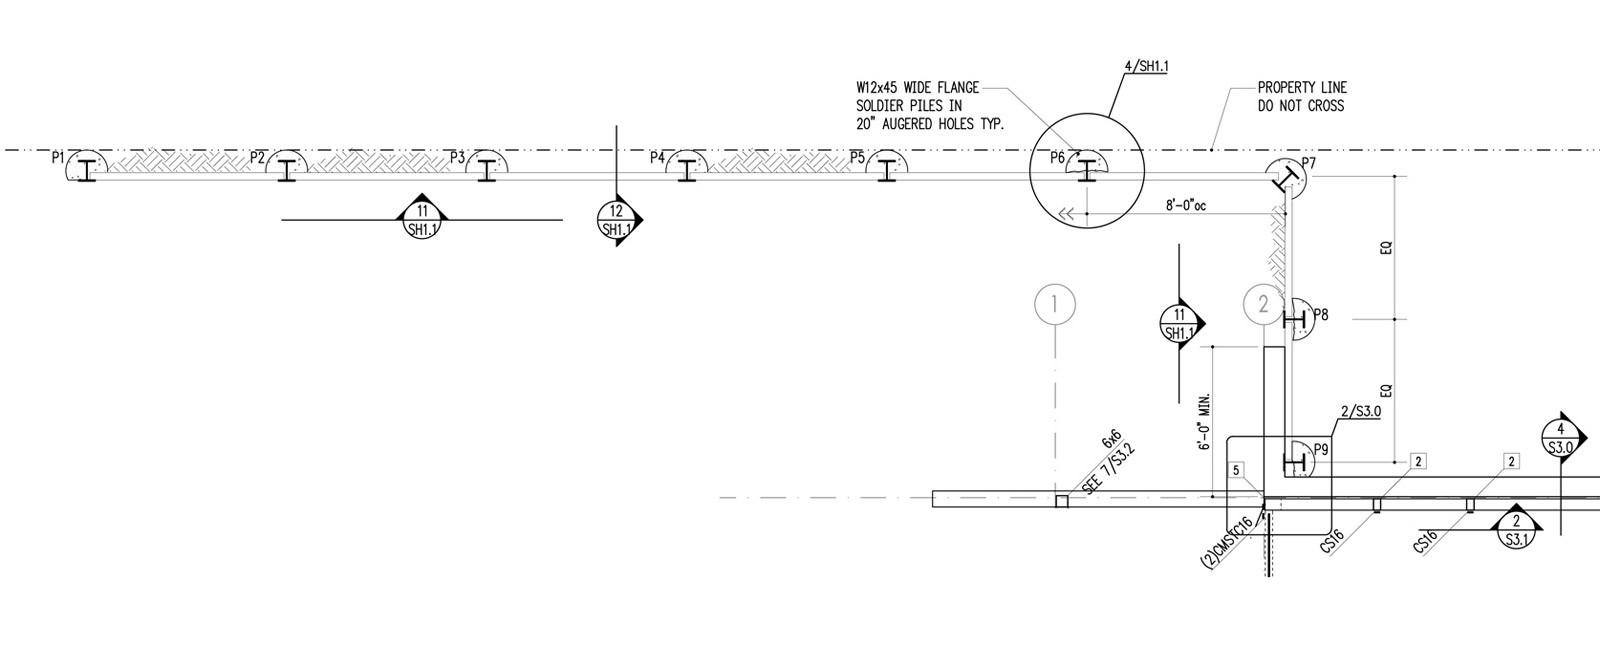 BUILD-LLC-Shoring-04-plan.jpg